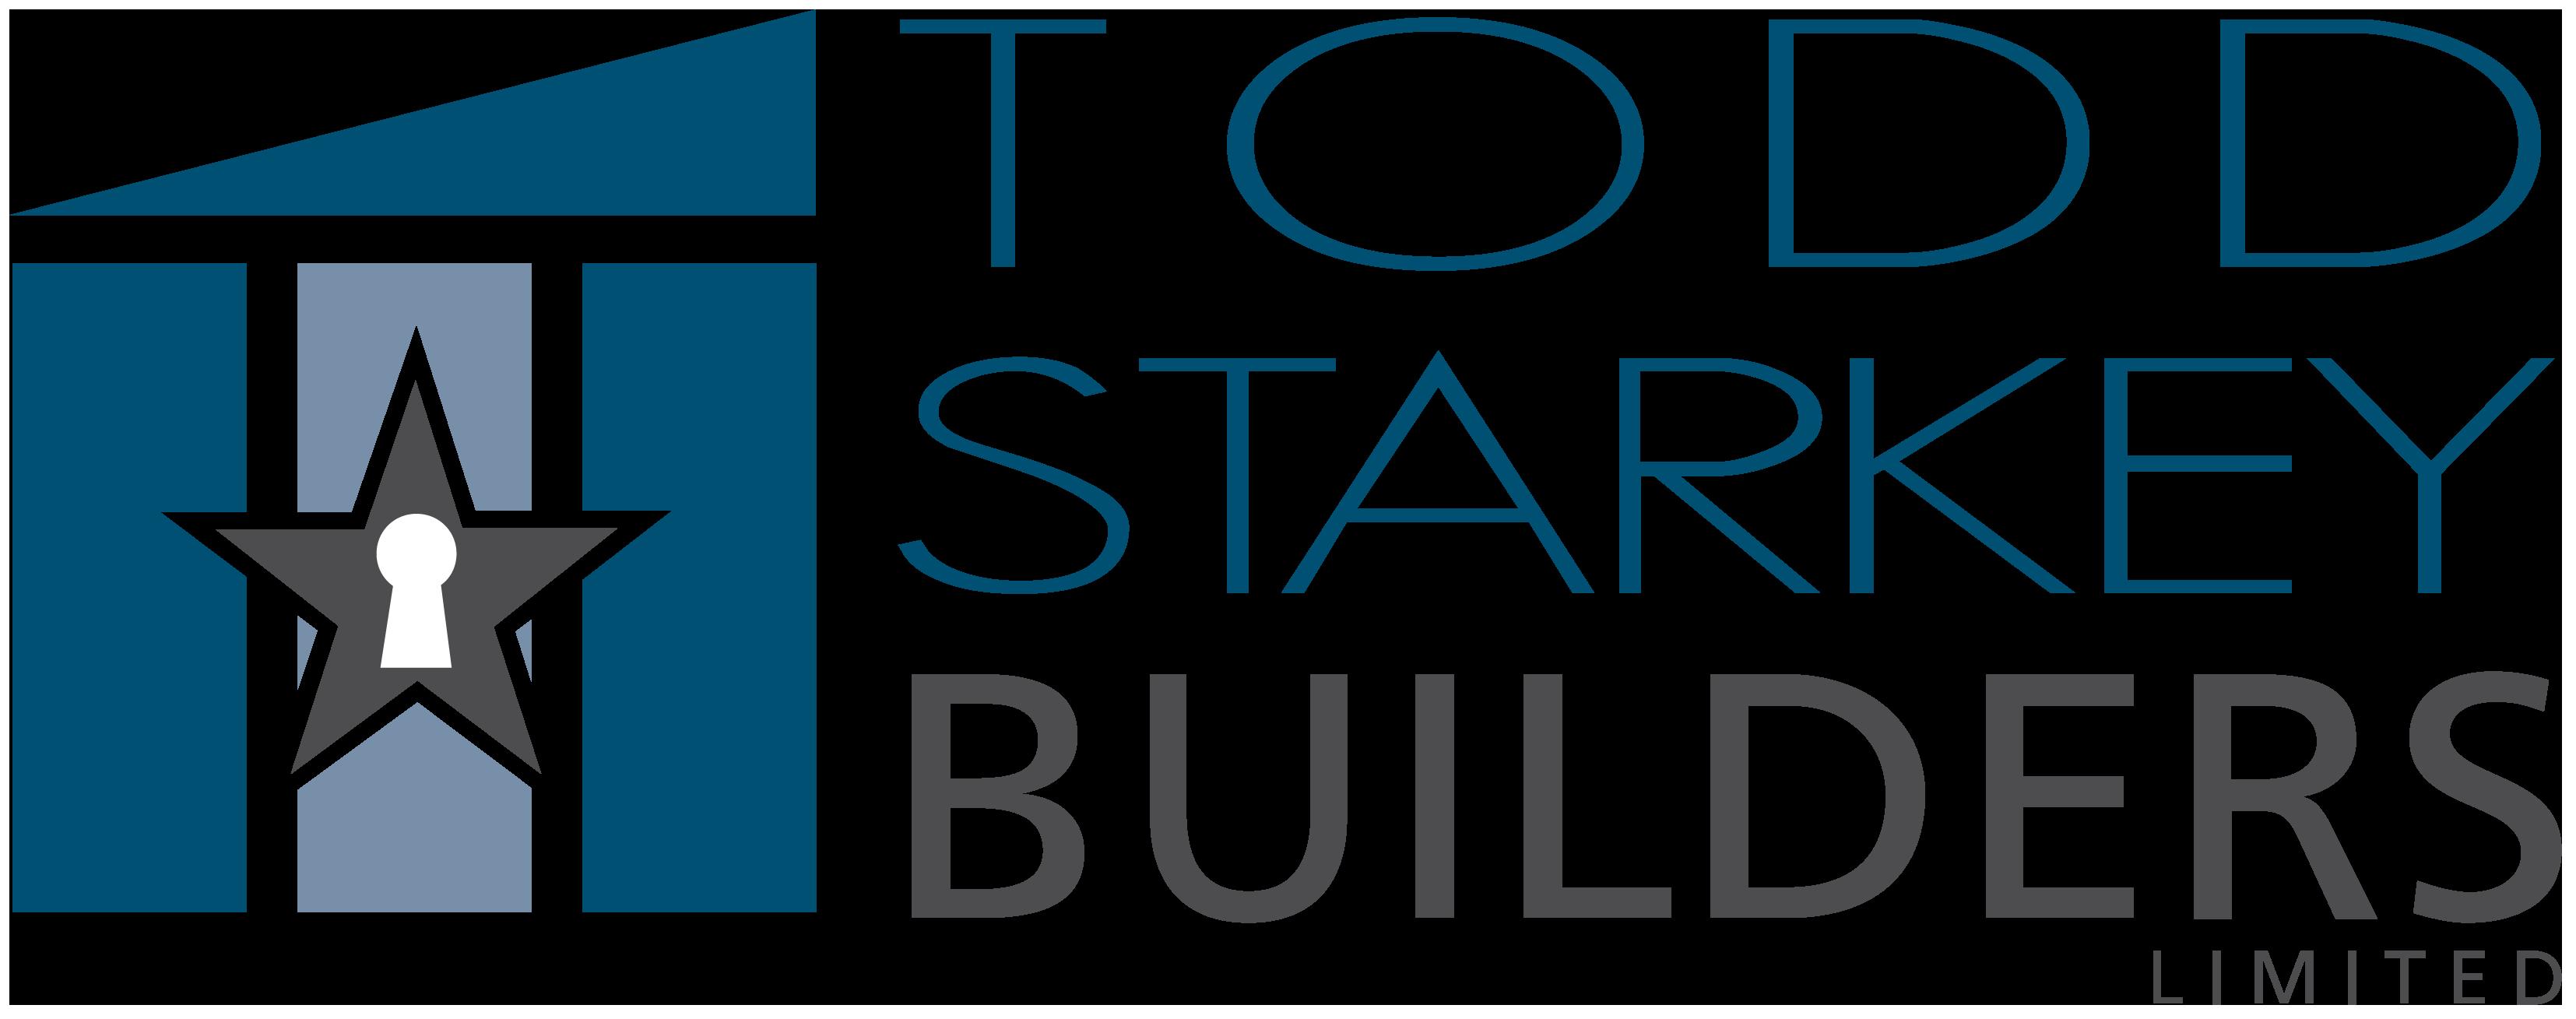 Todd Starkey Builders